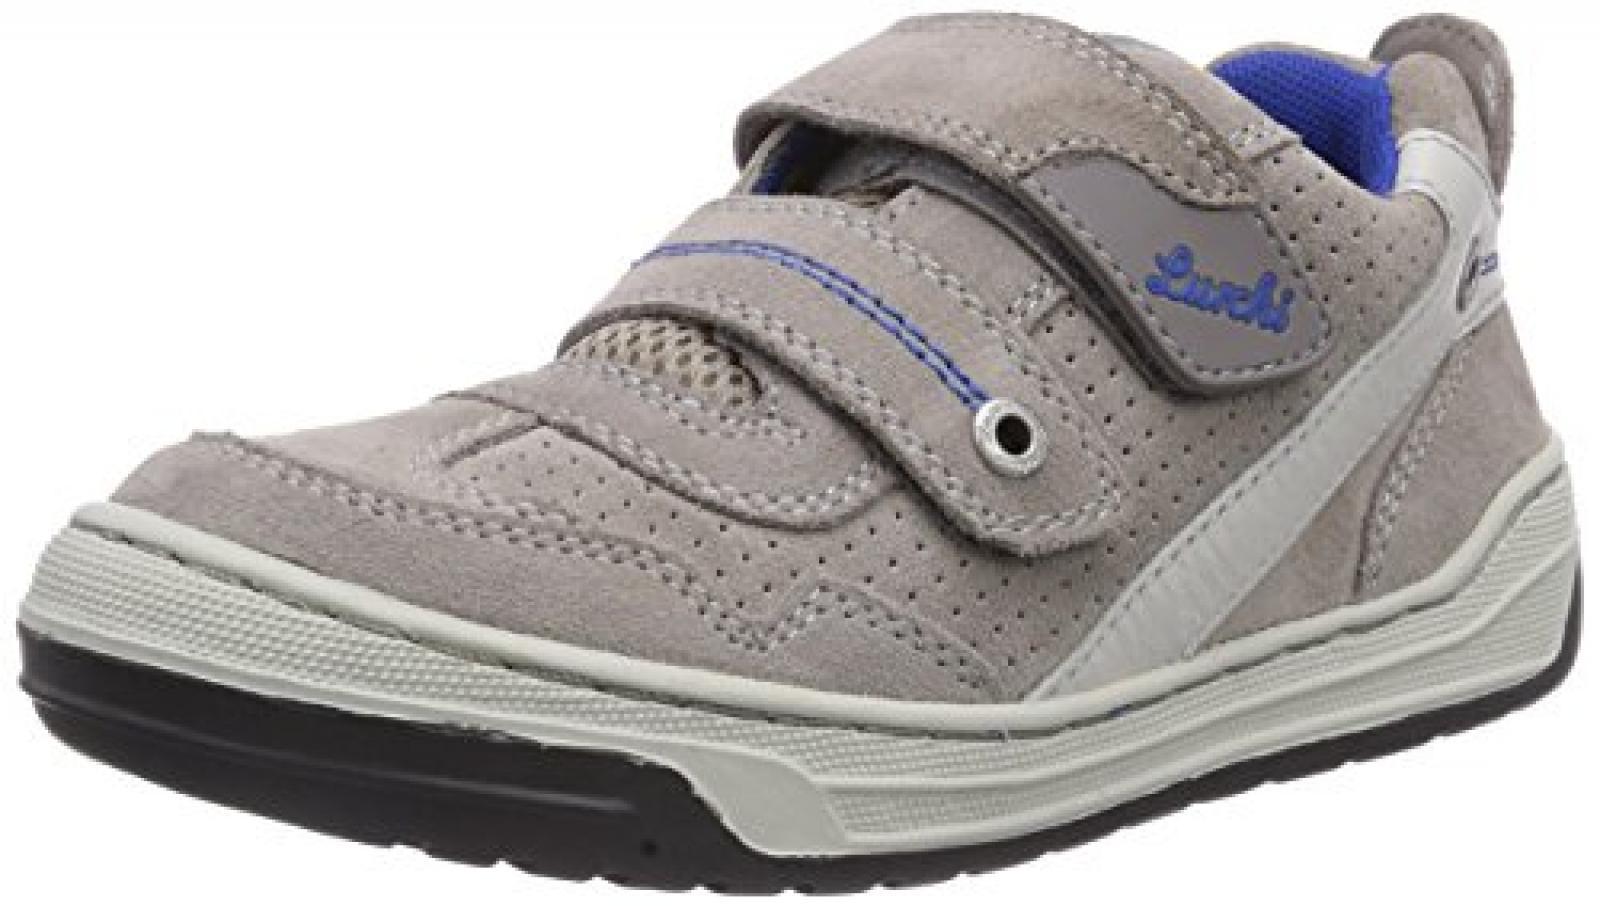 Lurchi Bruce Jungen Sneakers